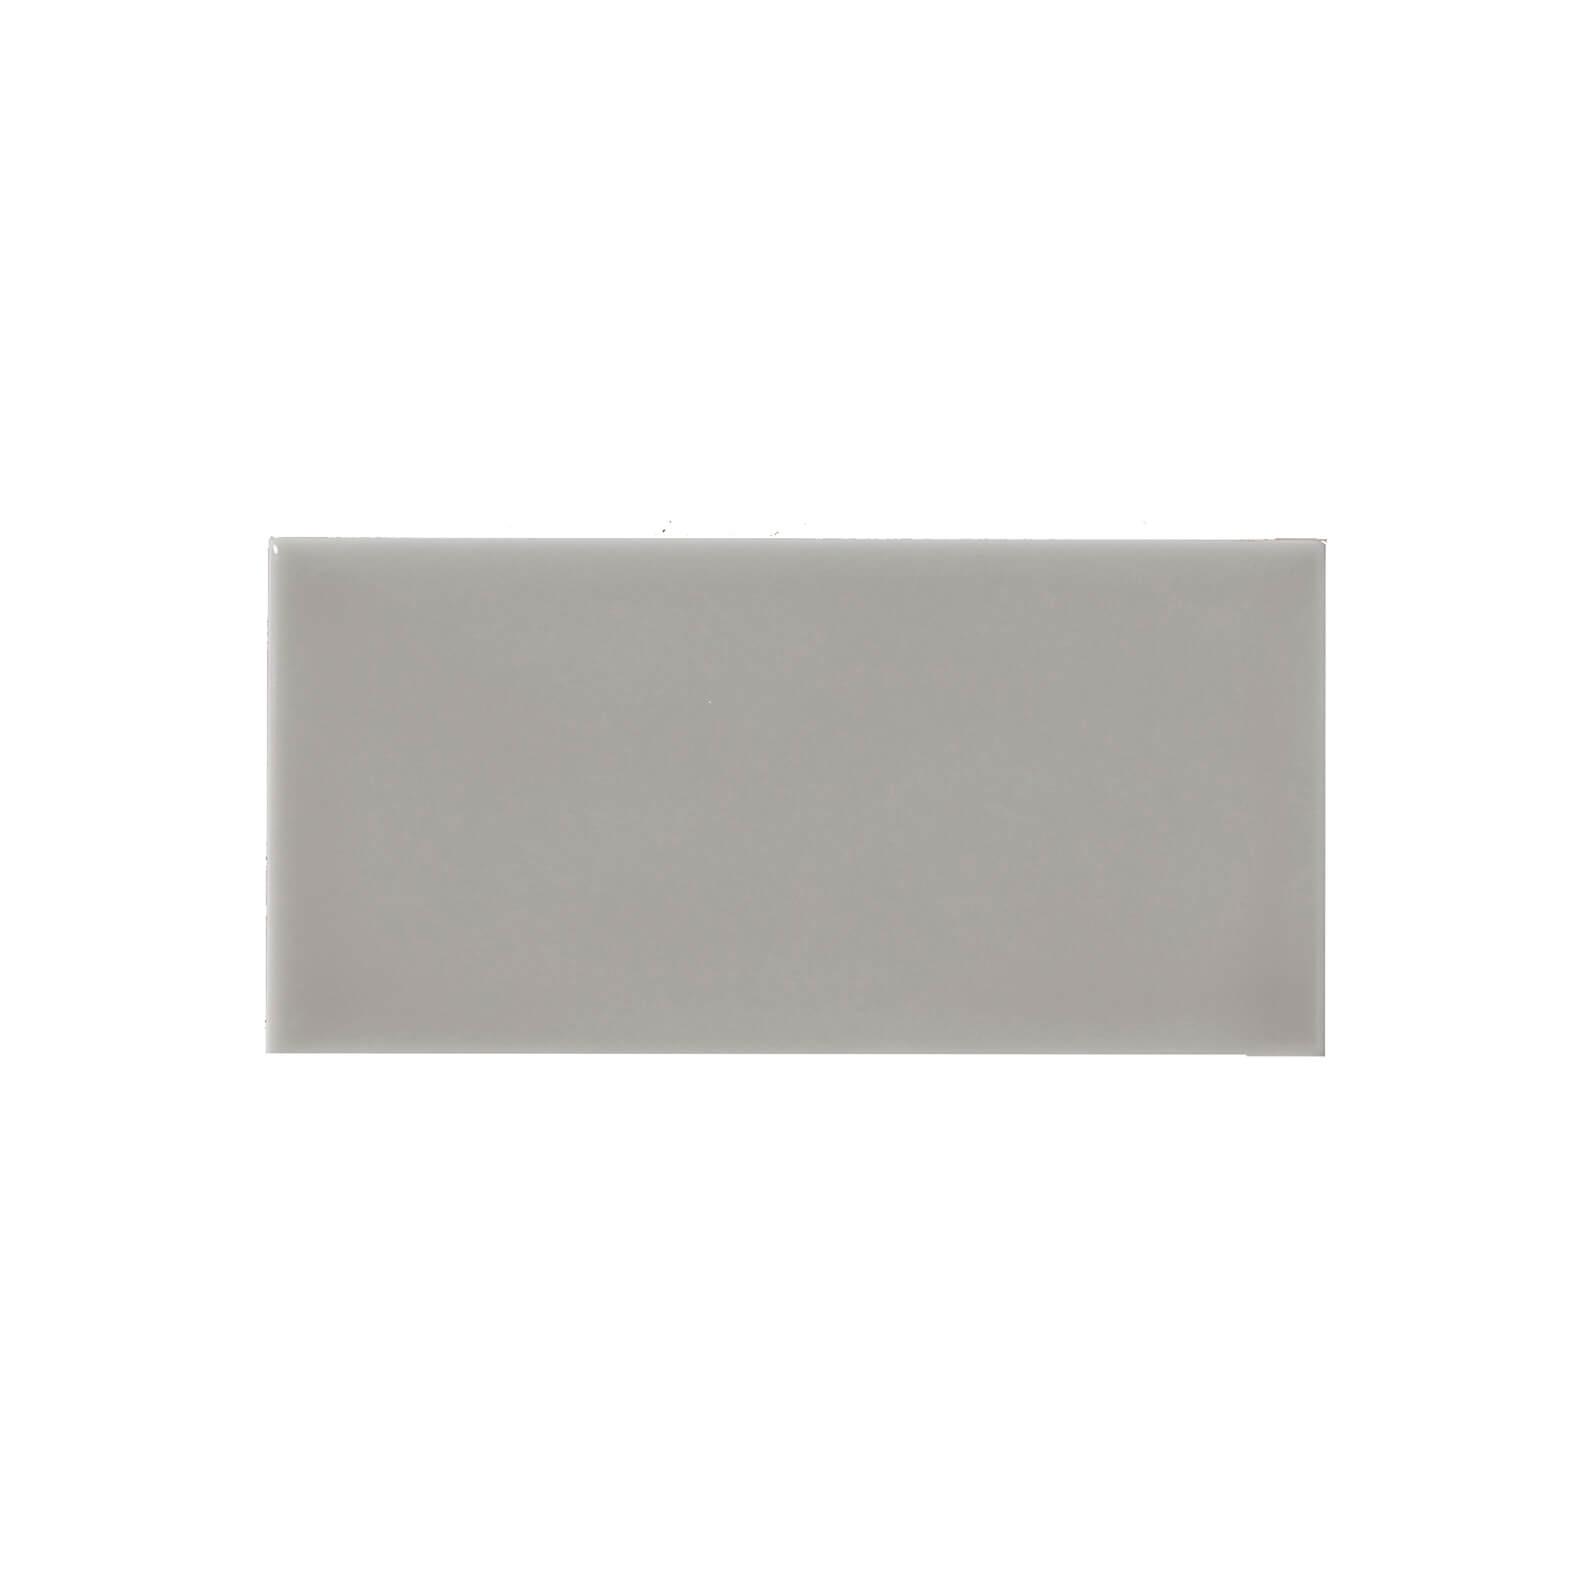 ADST1018 - LISO  - 7.3 cm X 14.8 cm